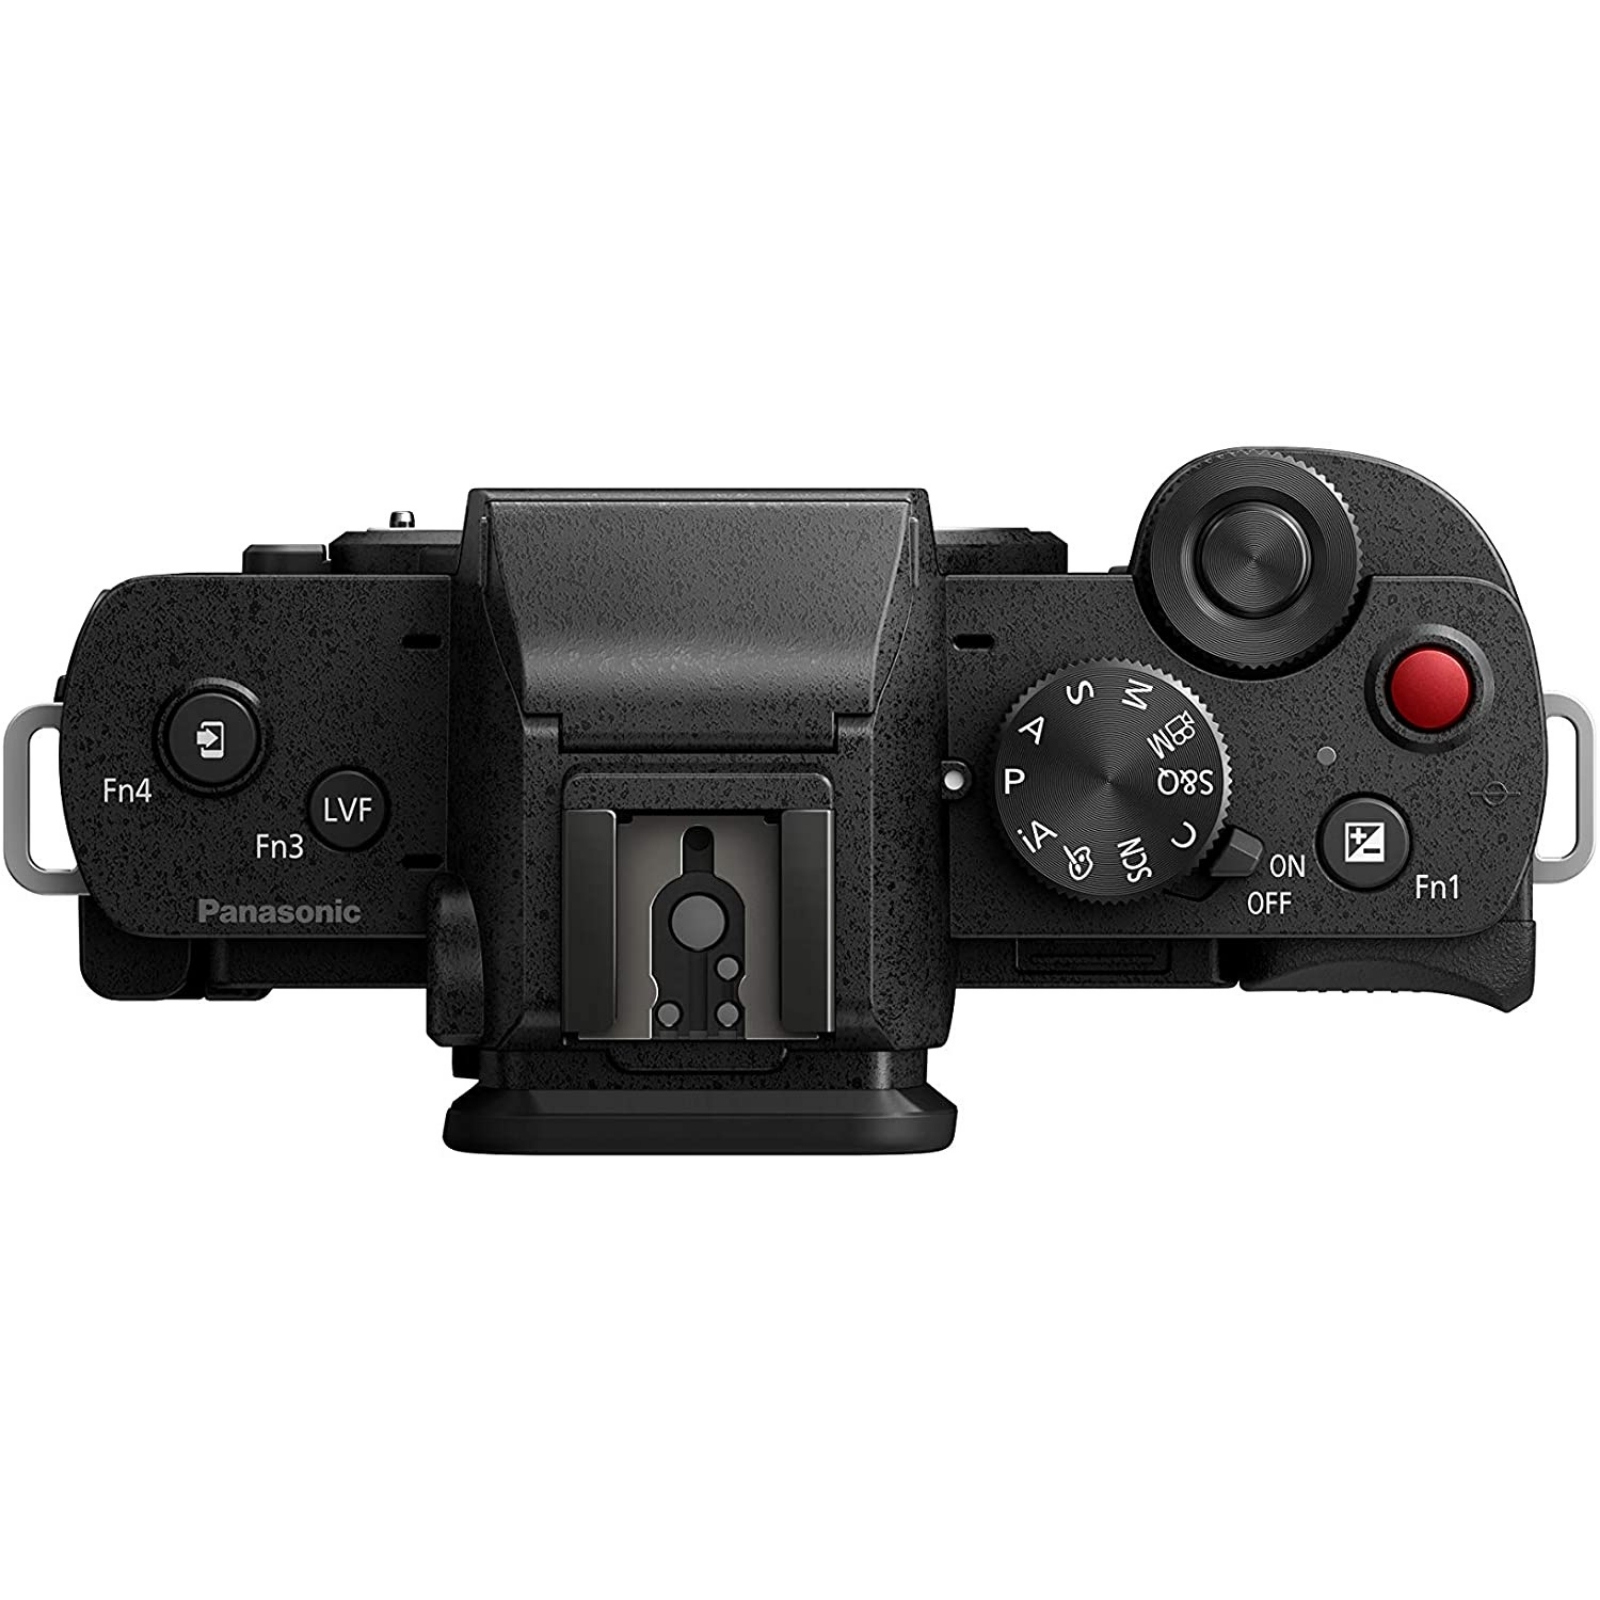 Panasonic パナソニック ミラーレス一眼カメラ LUMIX G100 ボディ ブラック DC-G100-K 新品